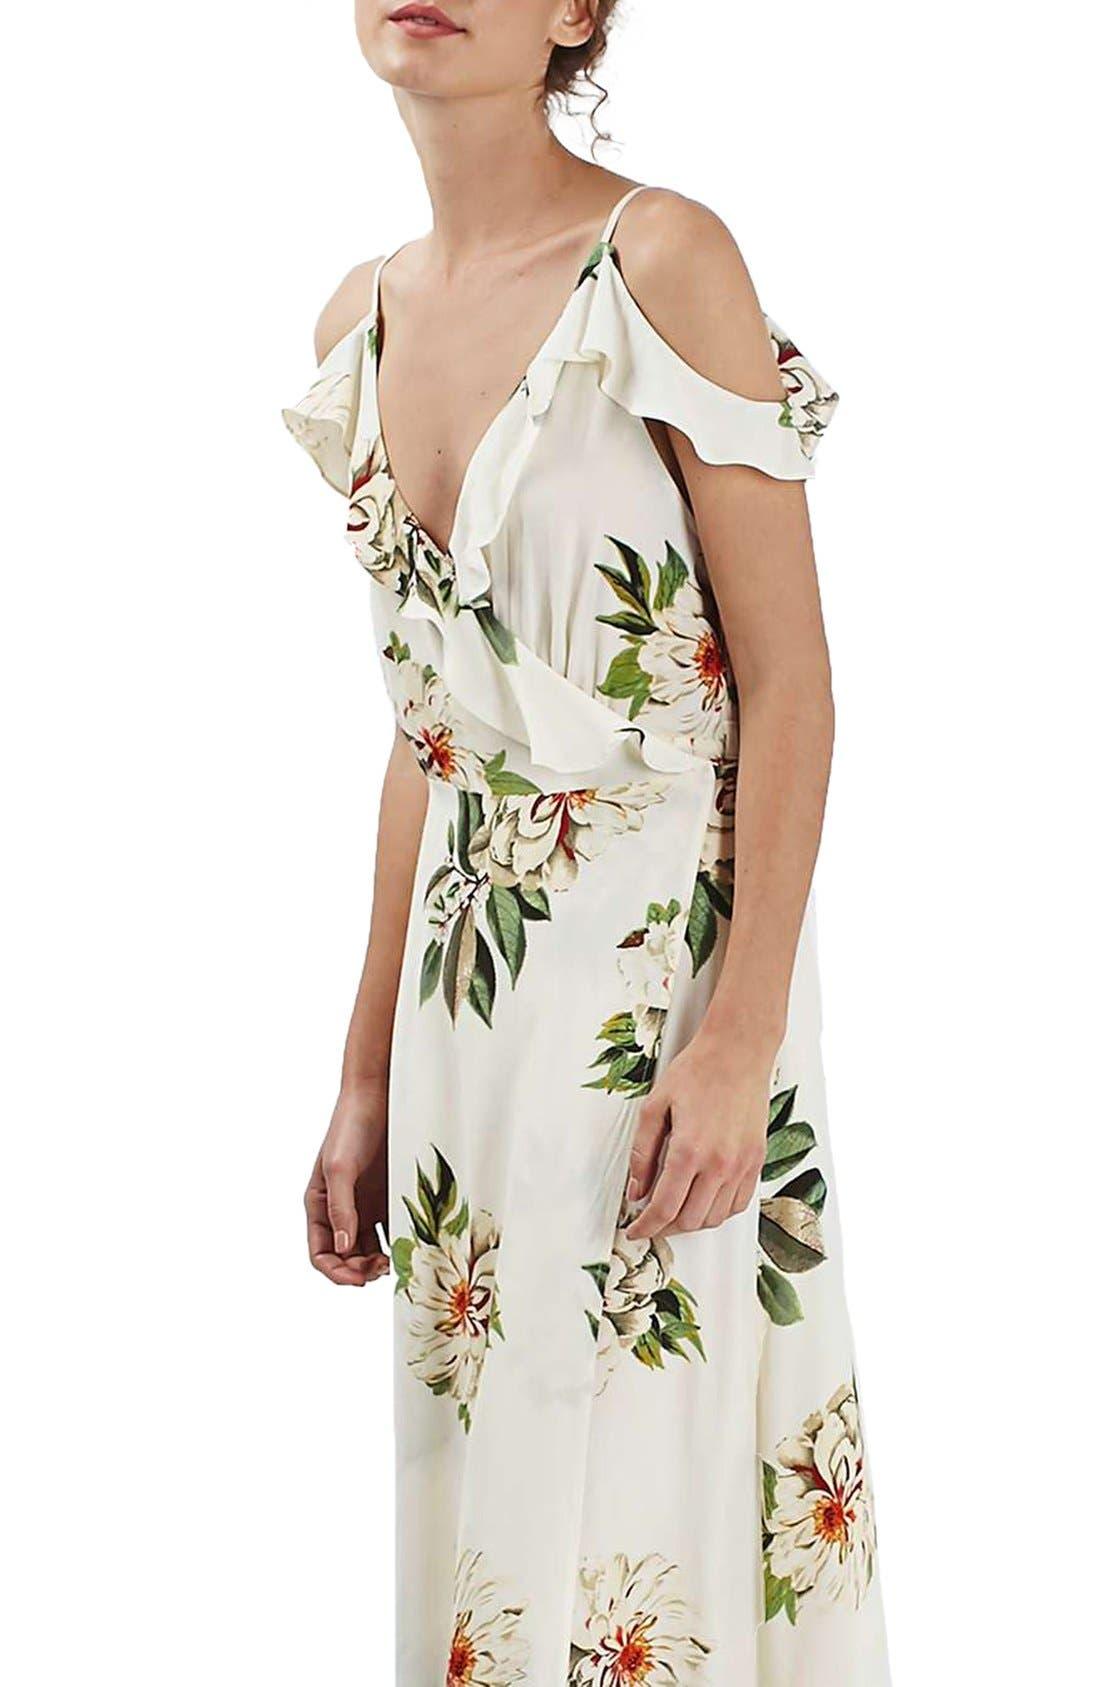 TOPSHOP, Floral Print Ruffle Cold Shoulder Wrap Maxi Dress, Main thumbnail 1, color, 900